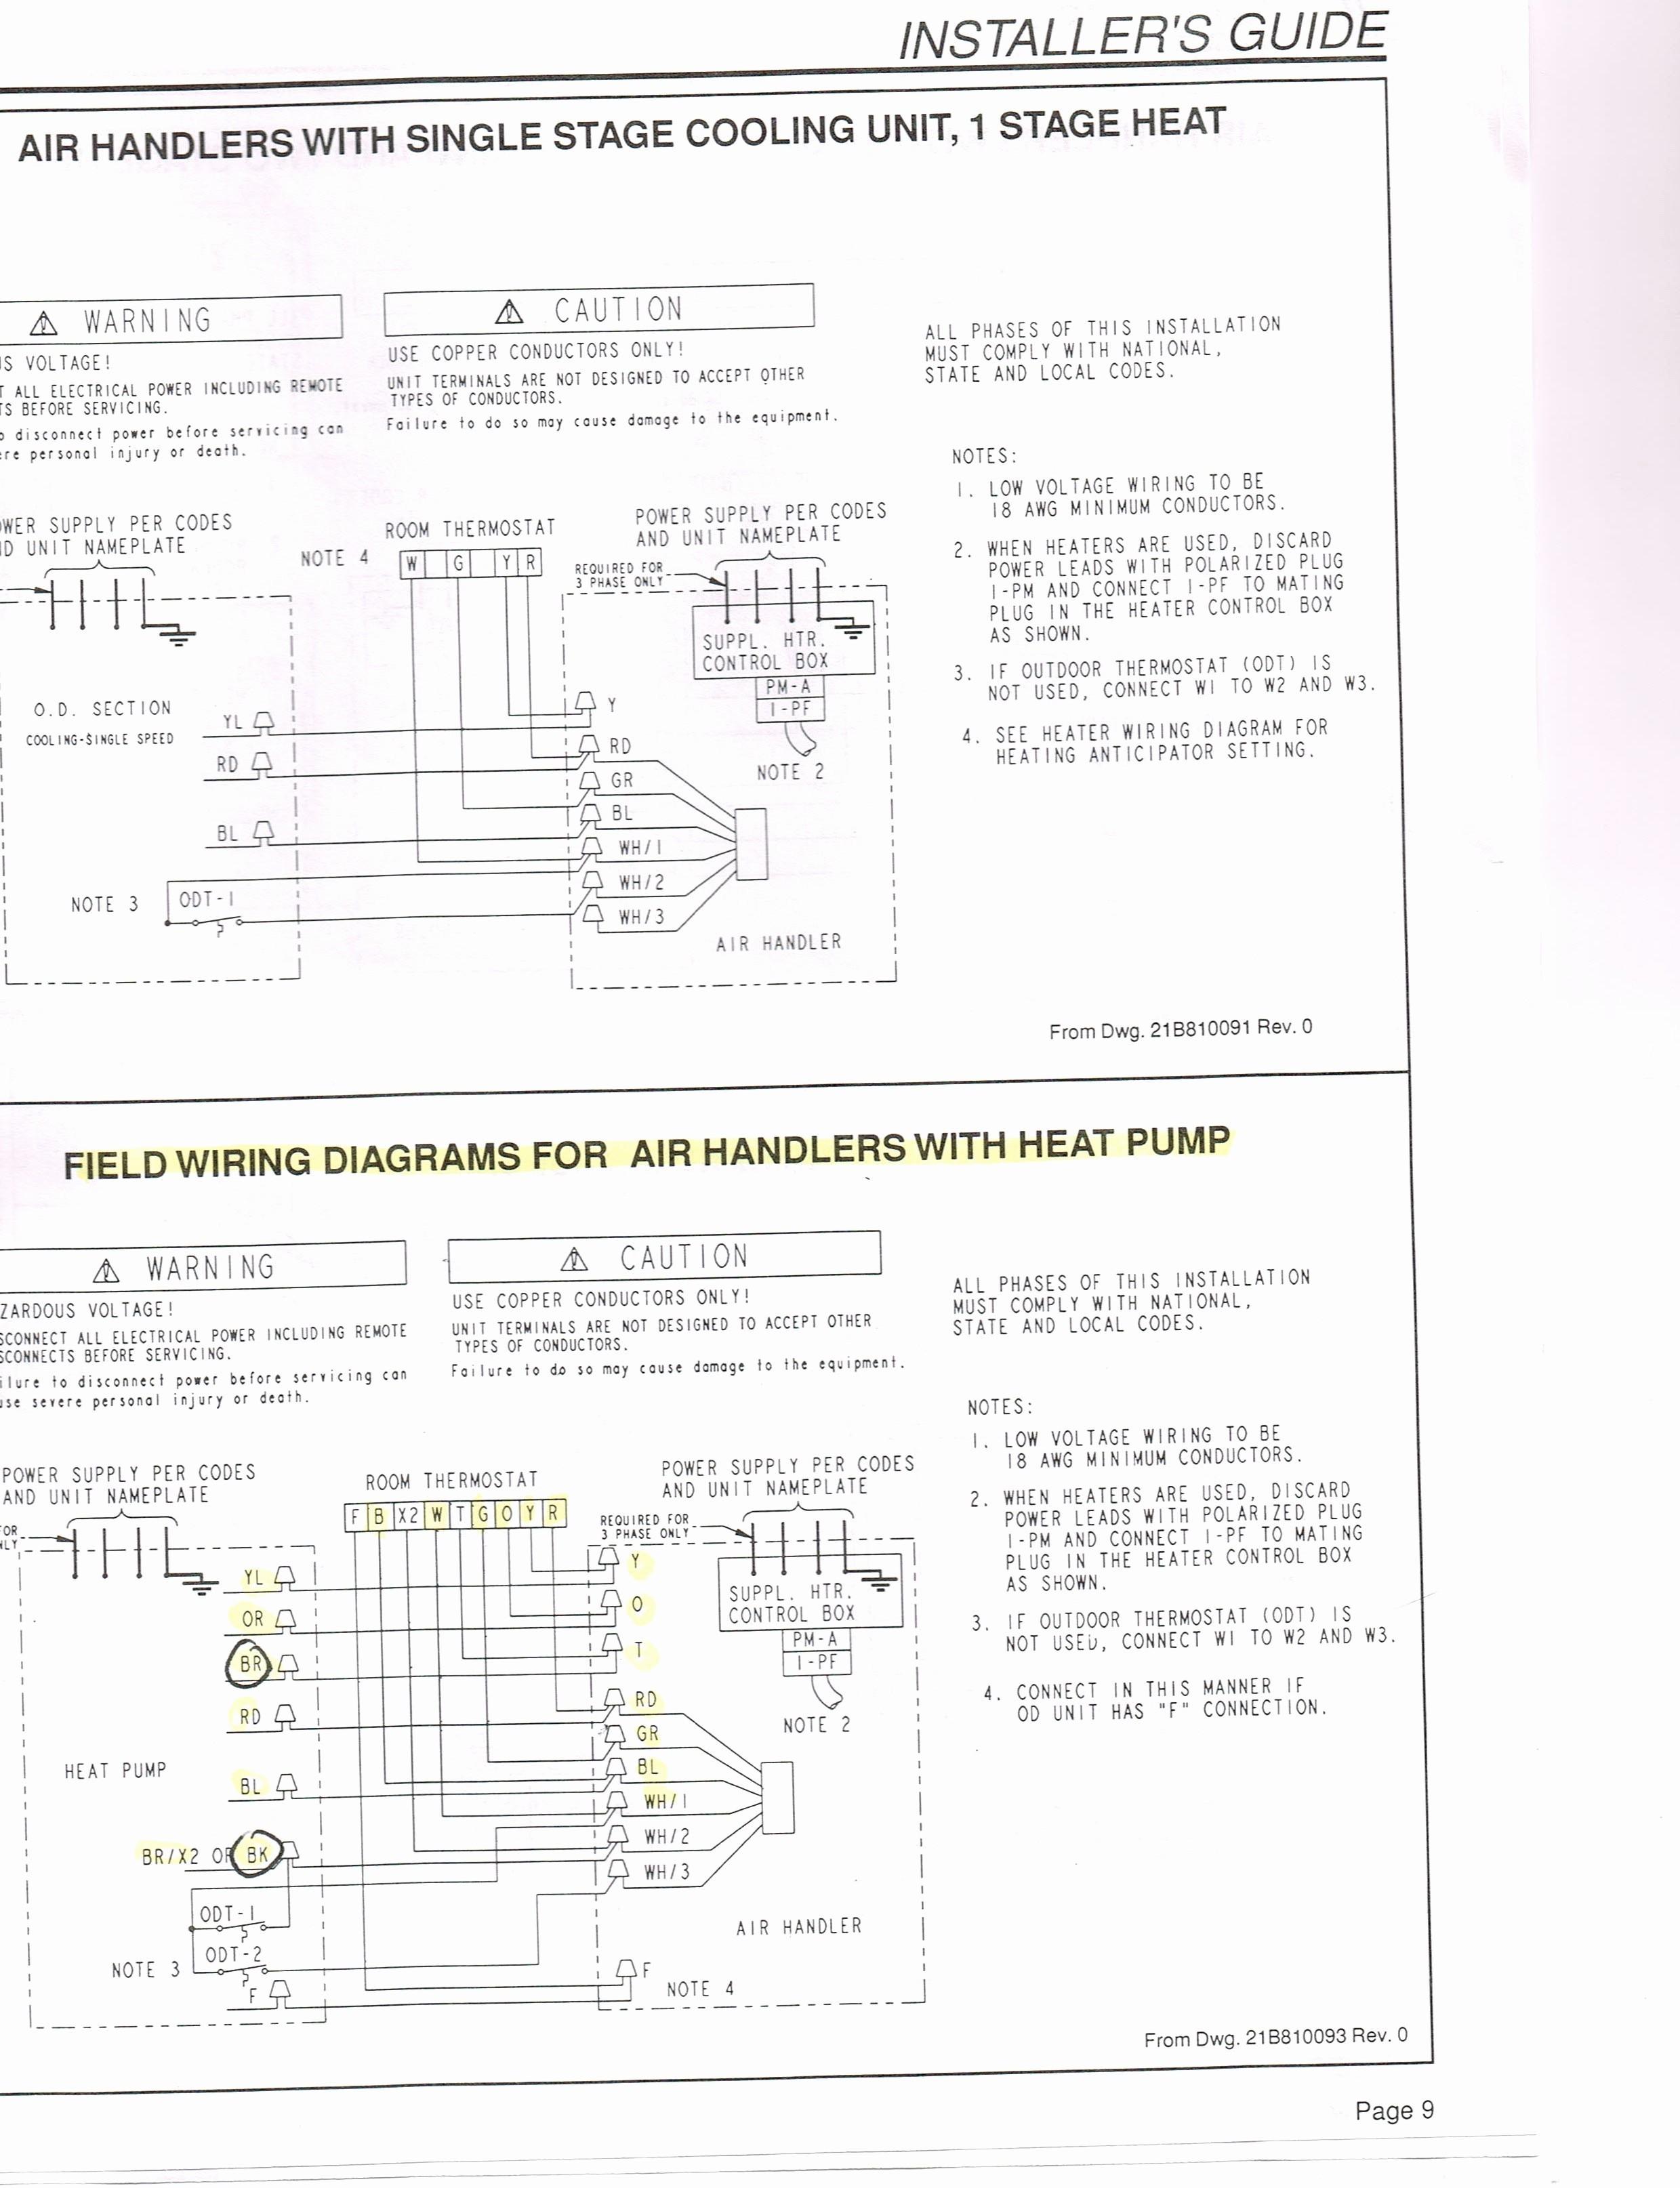 Honeywell Rth3100c thermostat Wiring Diagram Honeywell thermostat Relay Wiring Diagram Valid Trane thermostat Of Honeywell Rth3100c thermostat Wiring Diagram